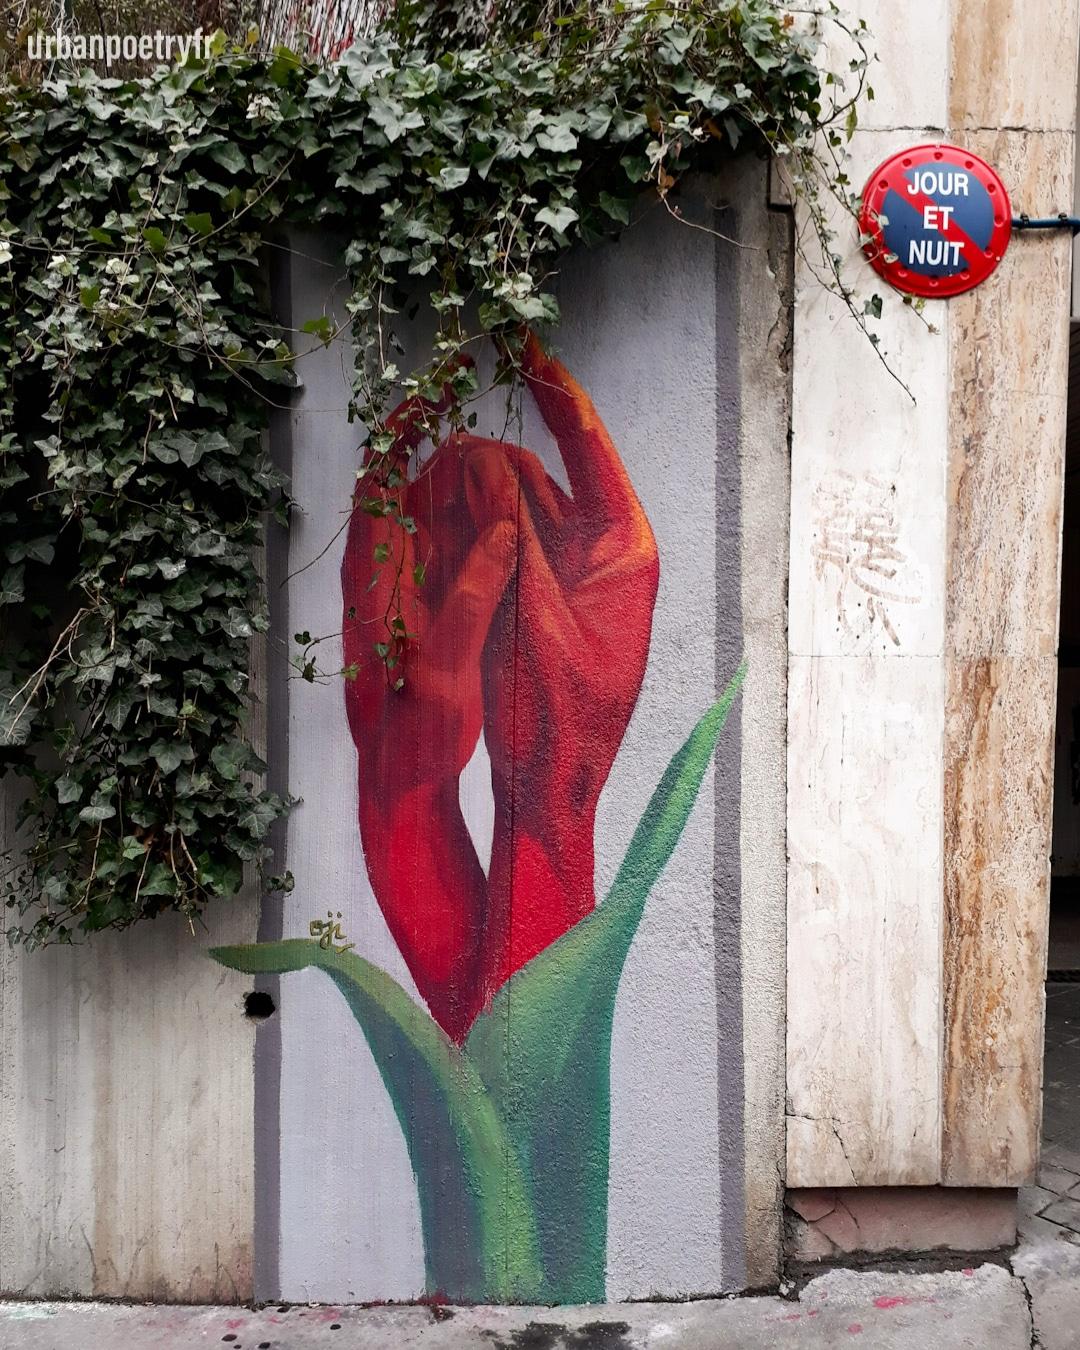 street art by Oji Urban Poetry